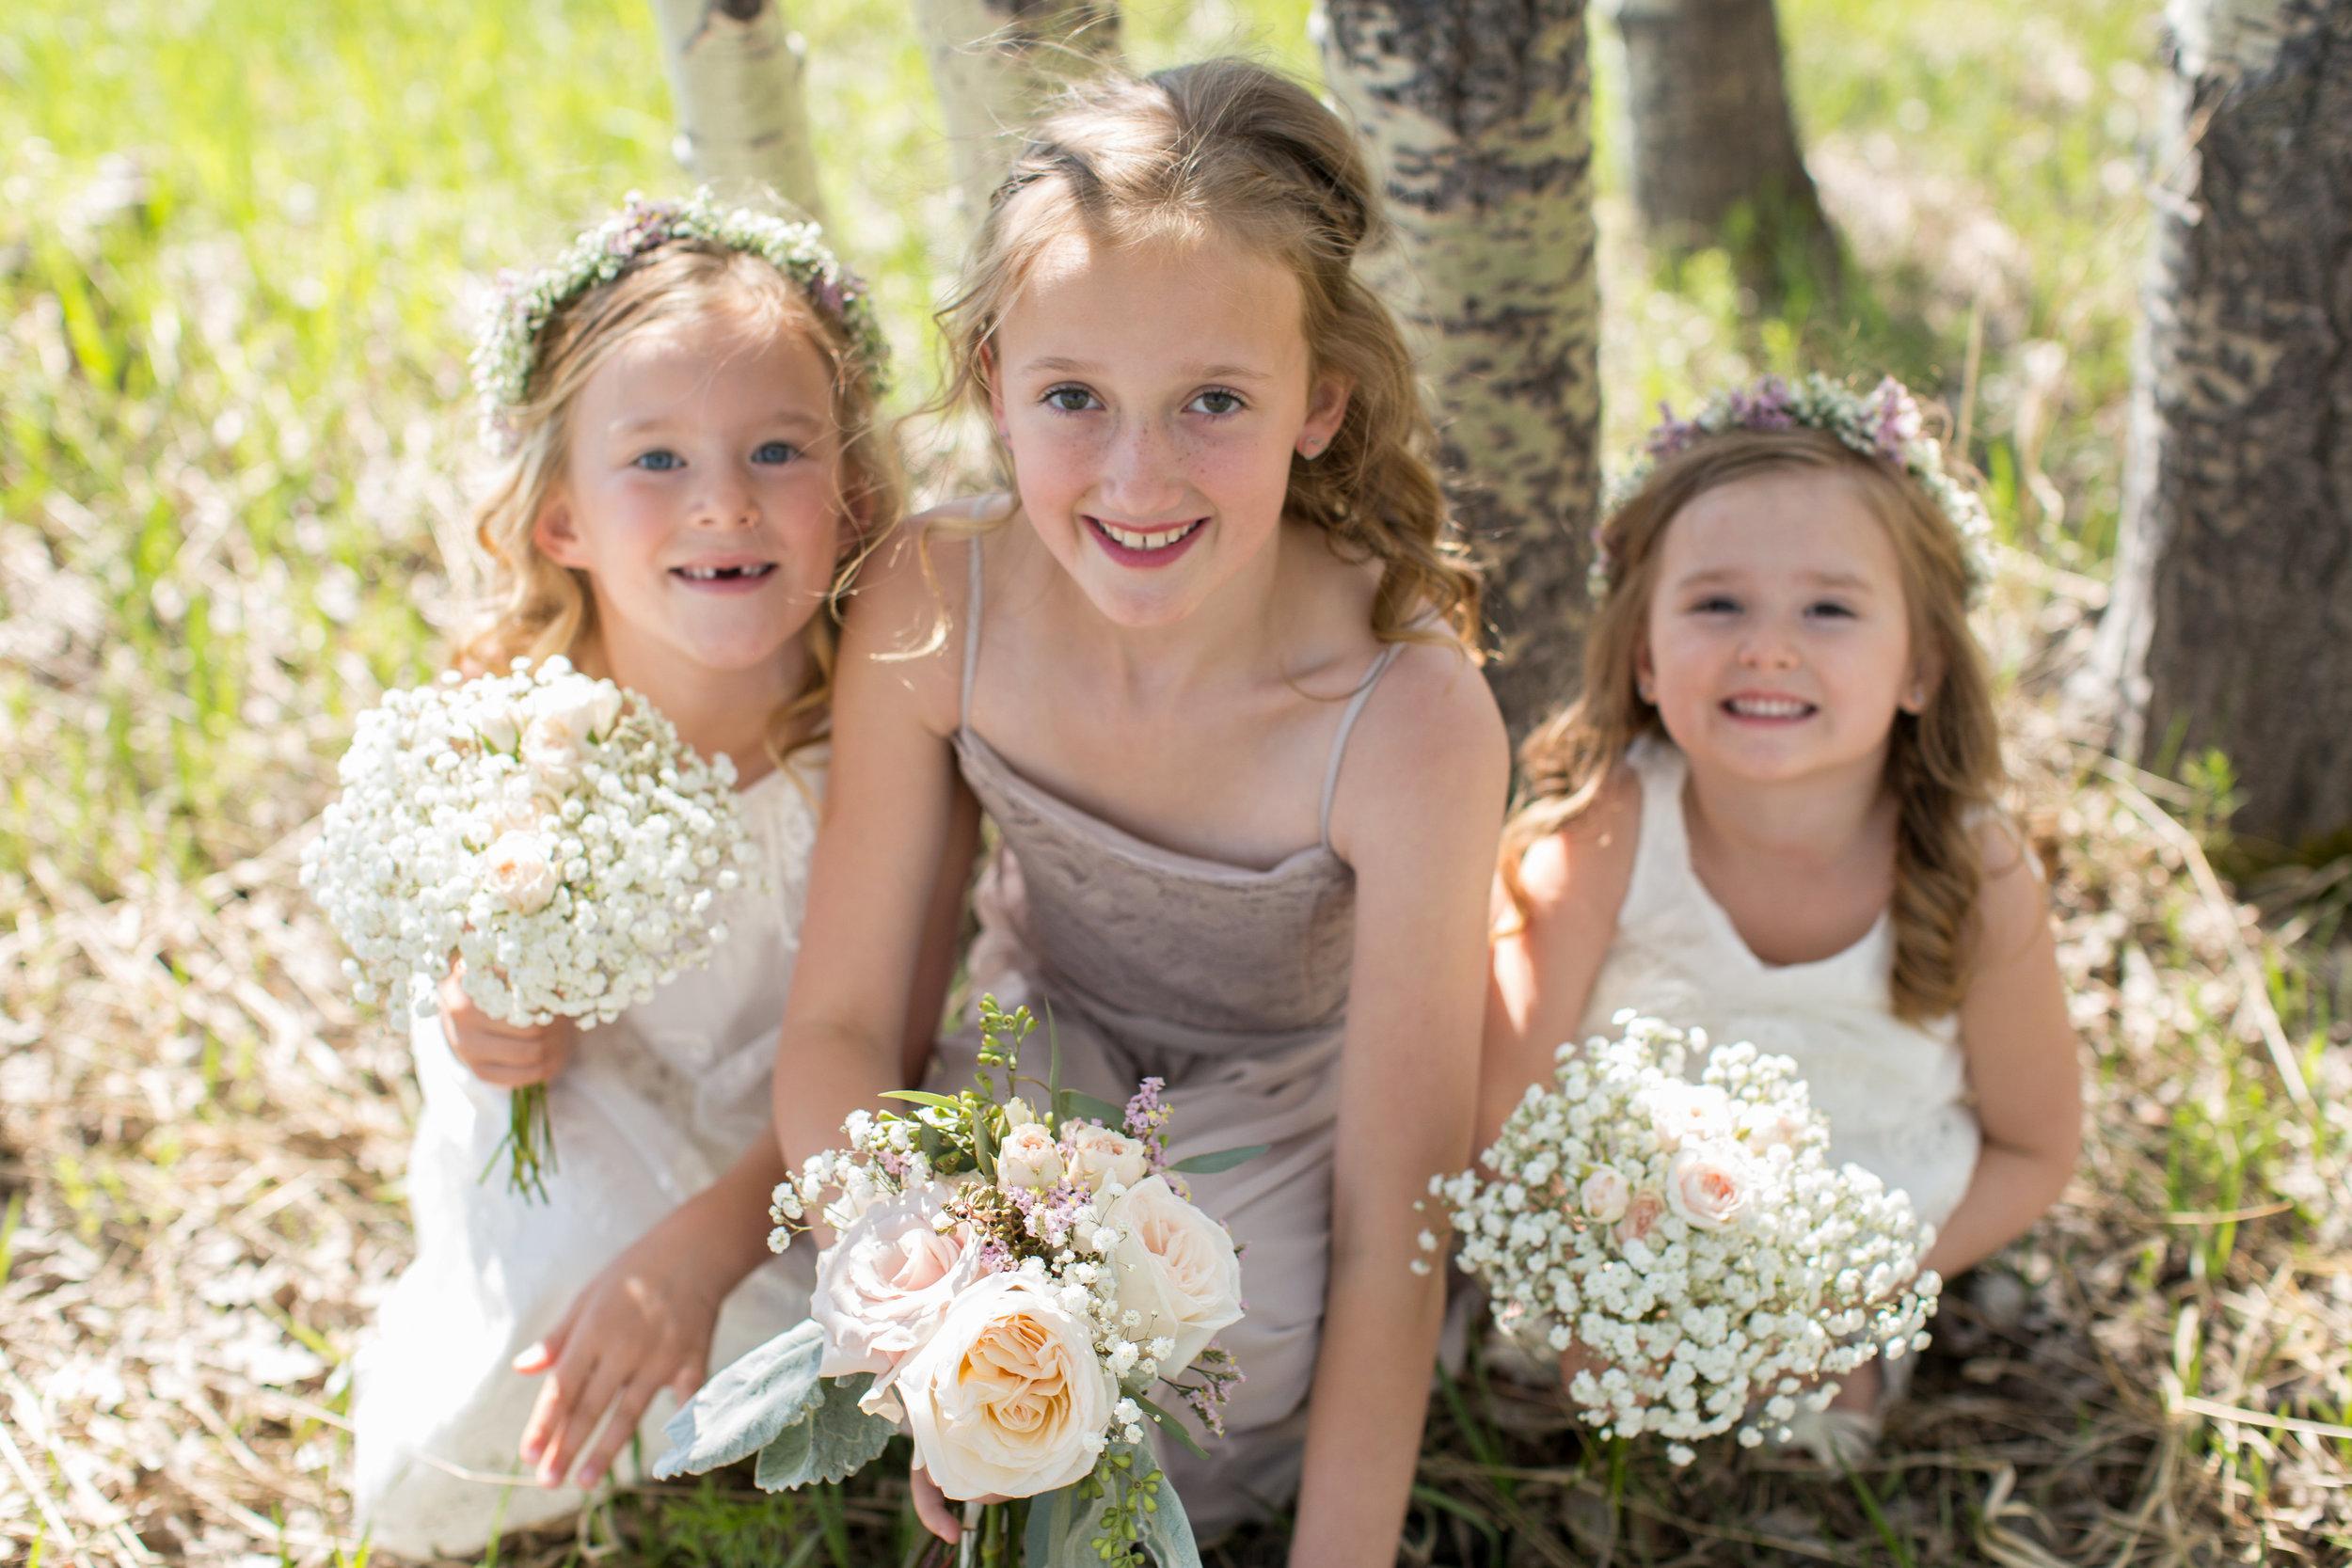 flower girl wedding flowers from calgary, alberta